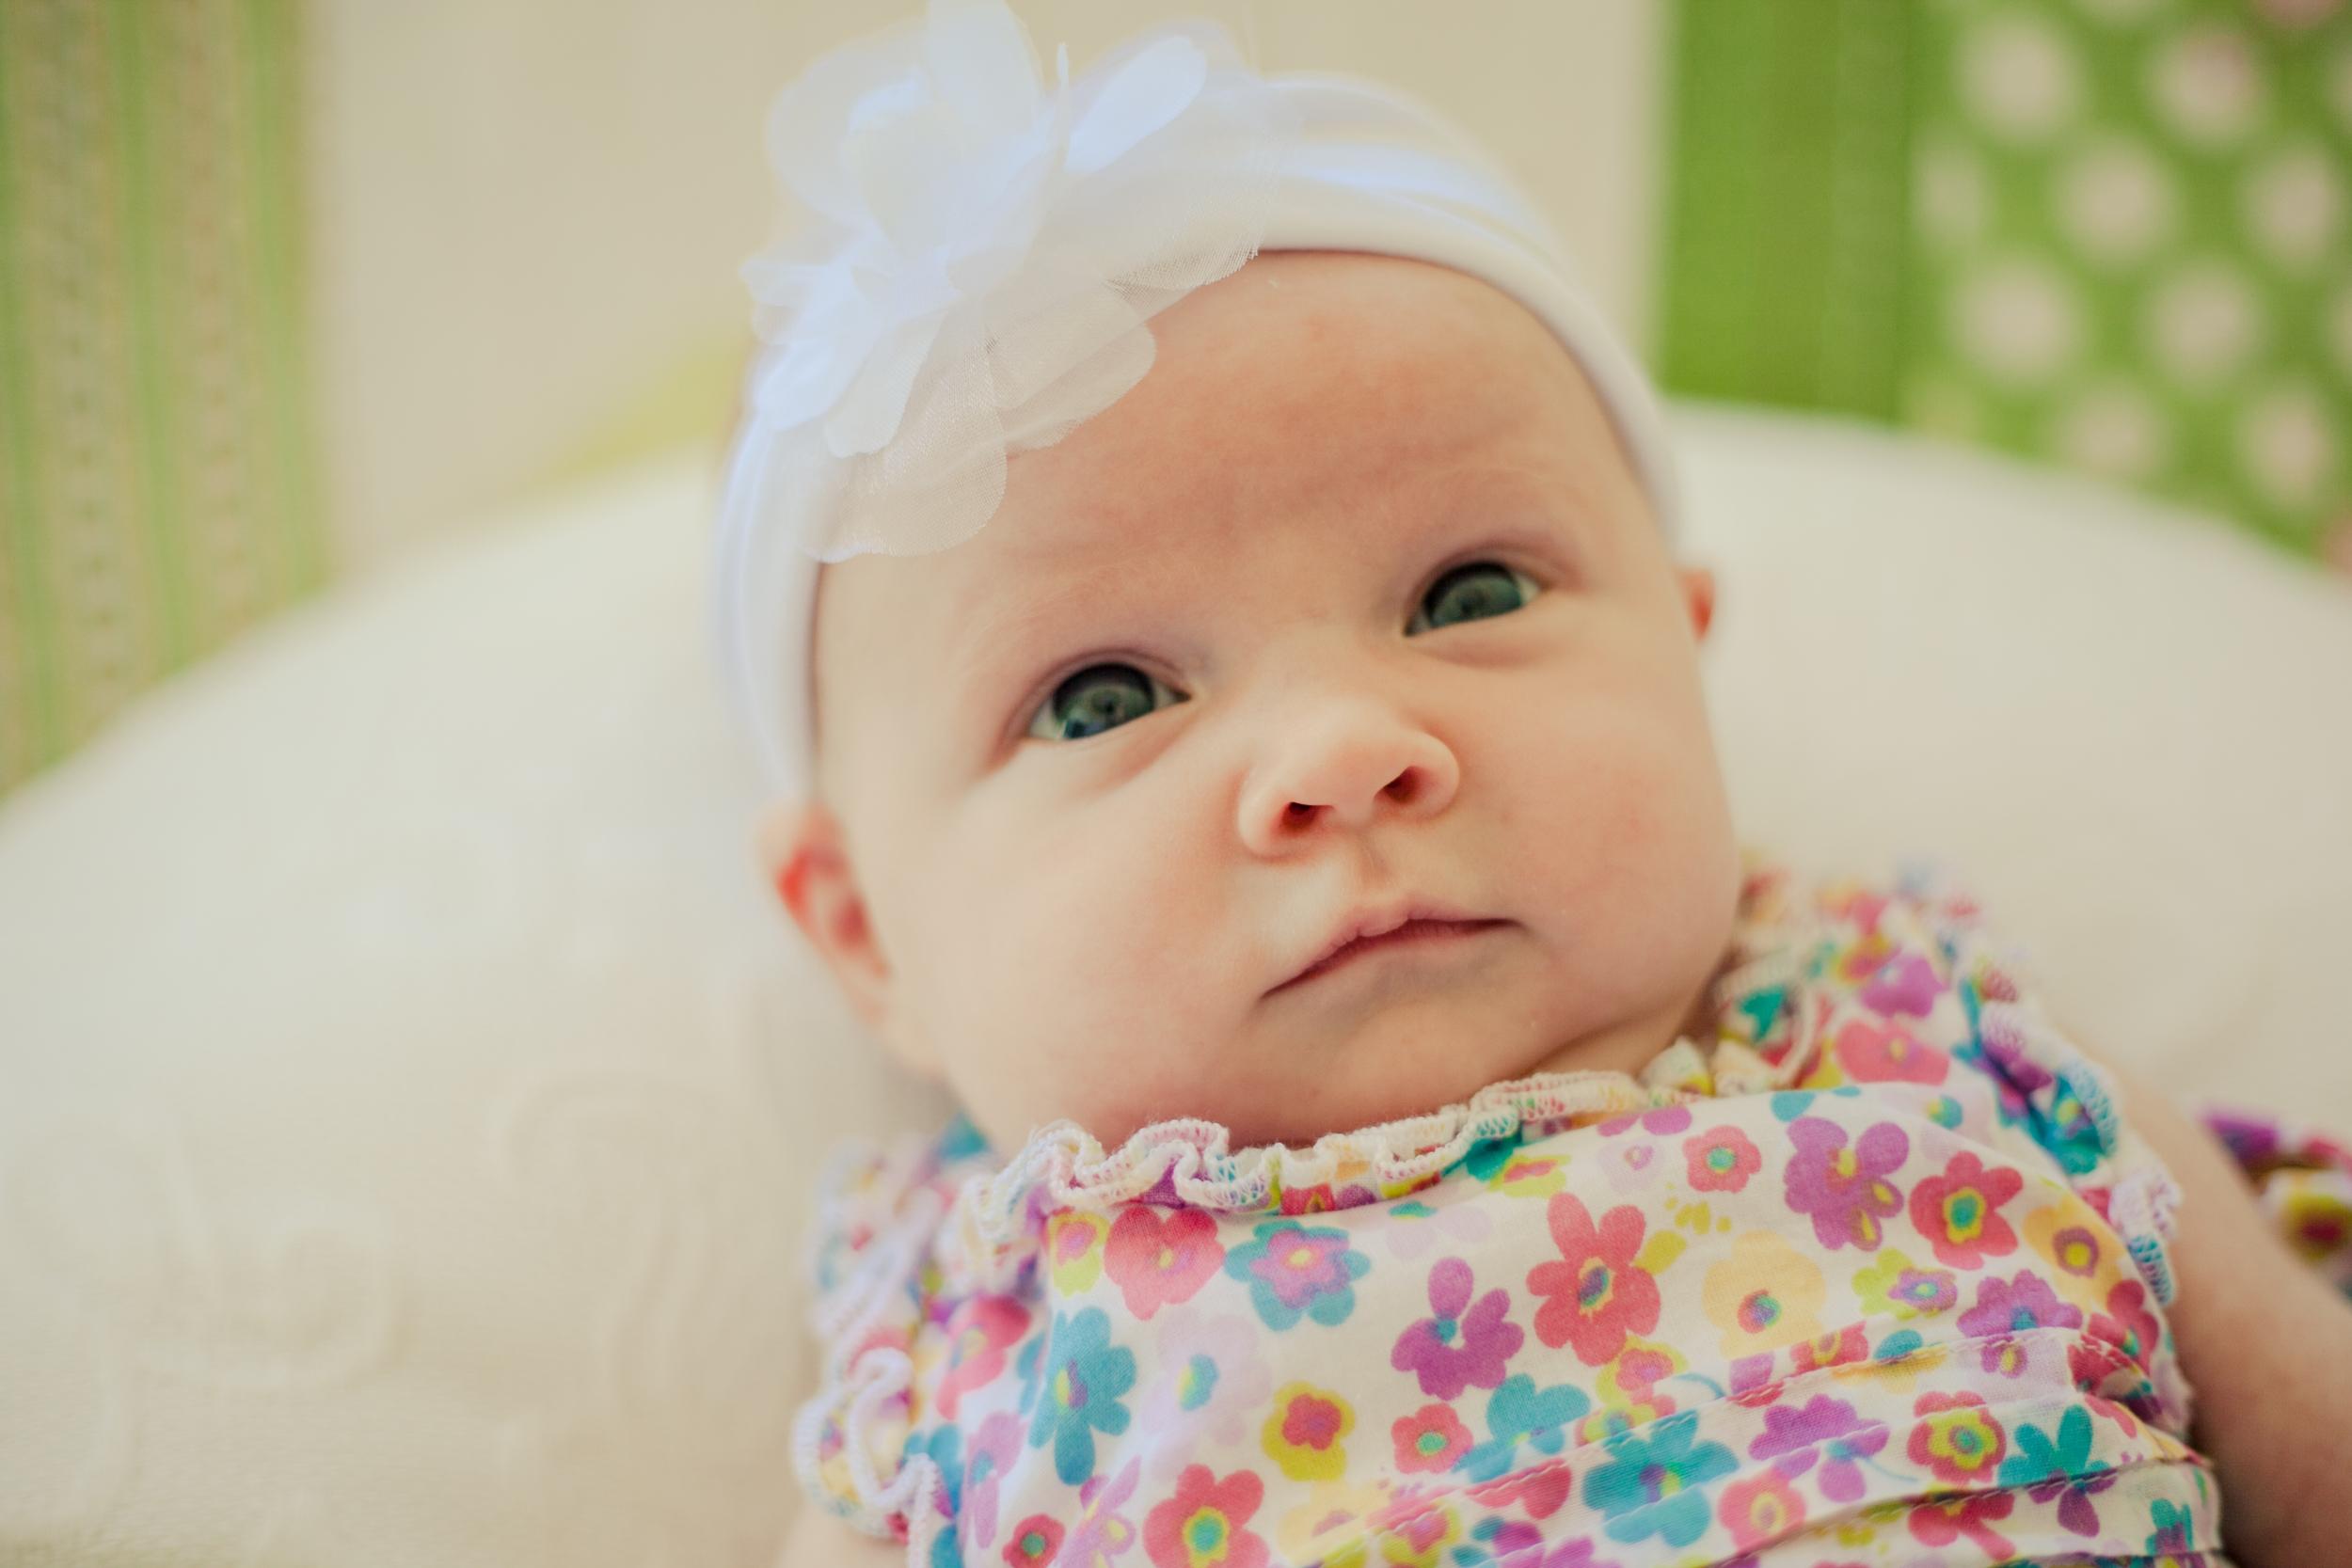 Richard Barlow Photography - Newborn Photography in North CarolinaRichard Barlow Photography - Newborn Photography in North Carolina